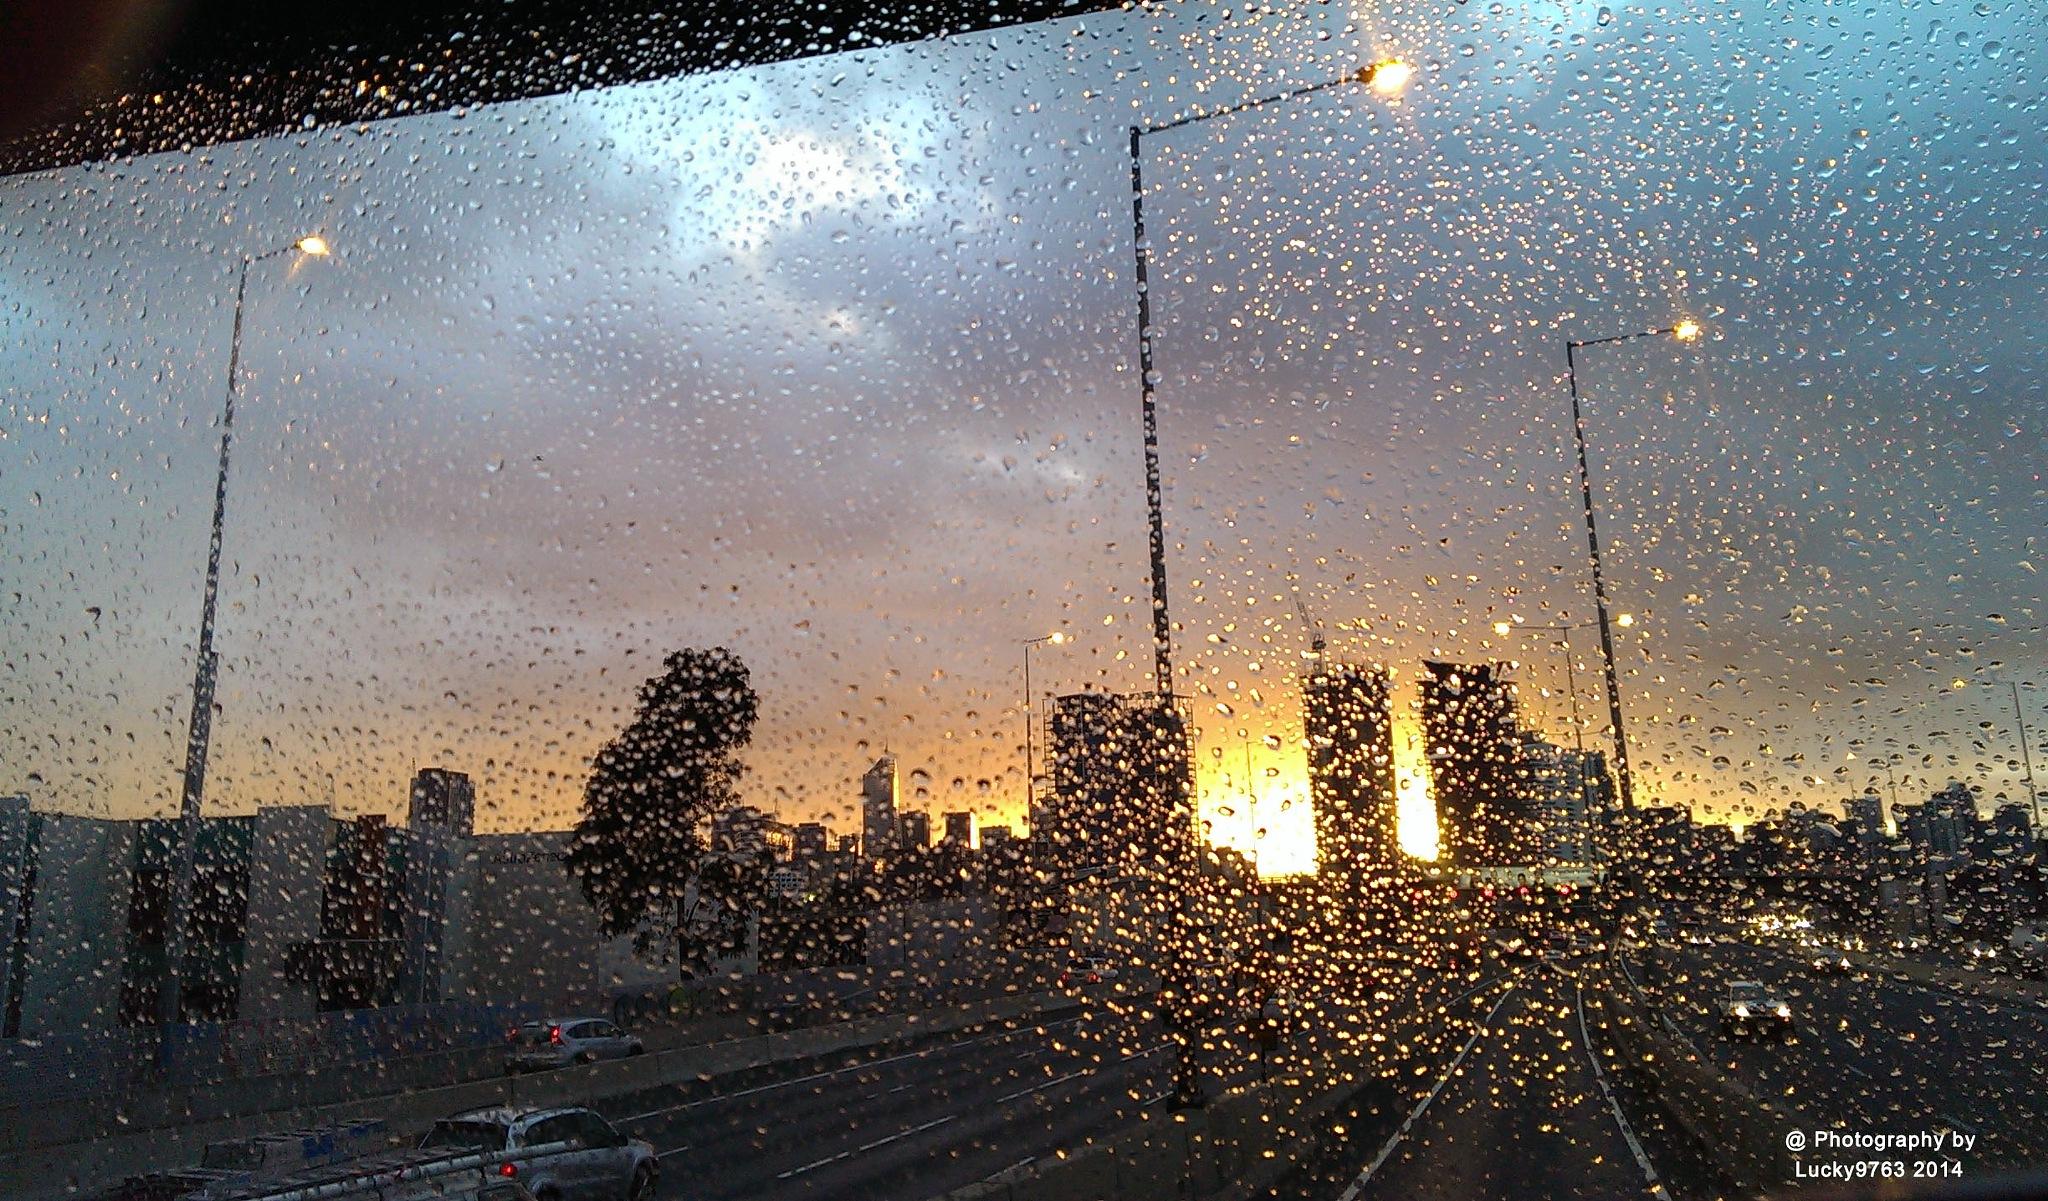 Driving in the Rains 2014 by Attila Erdei